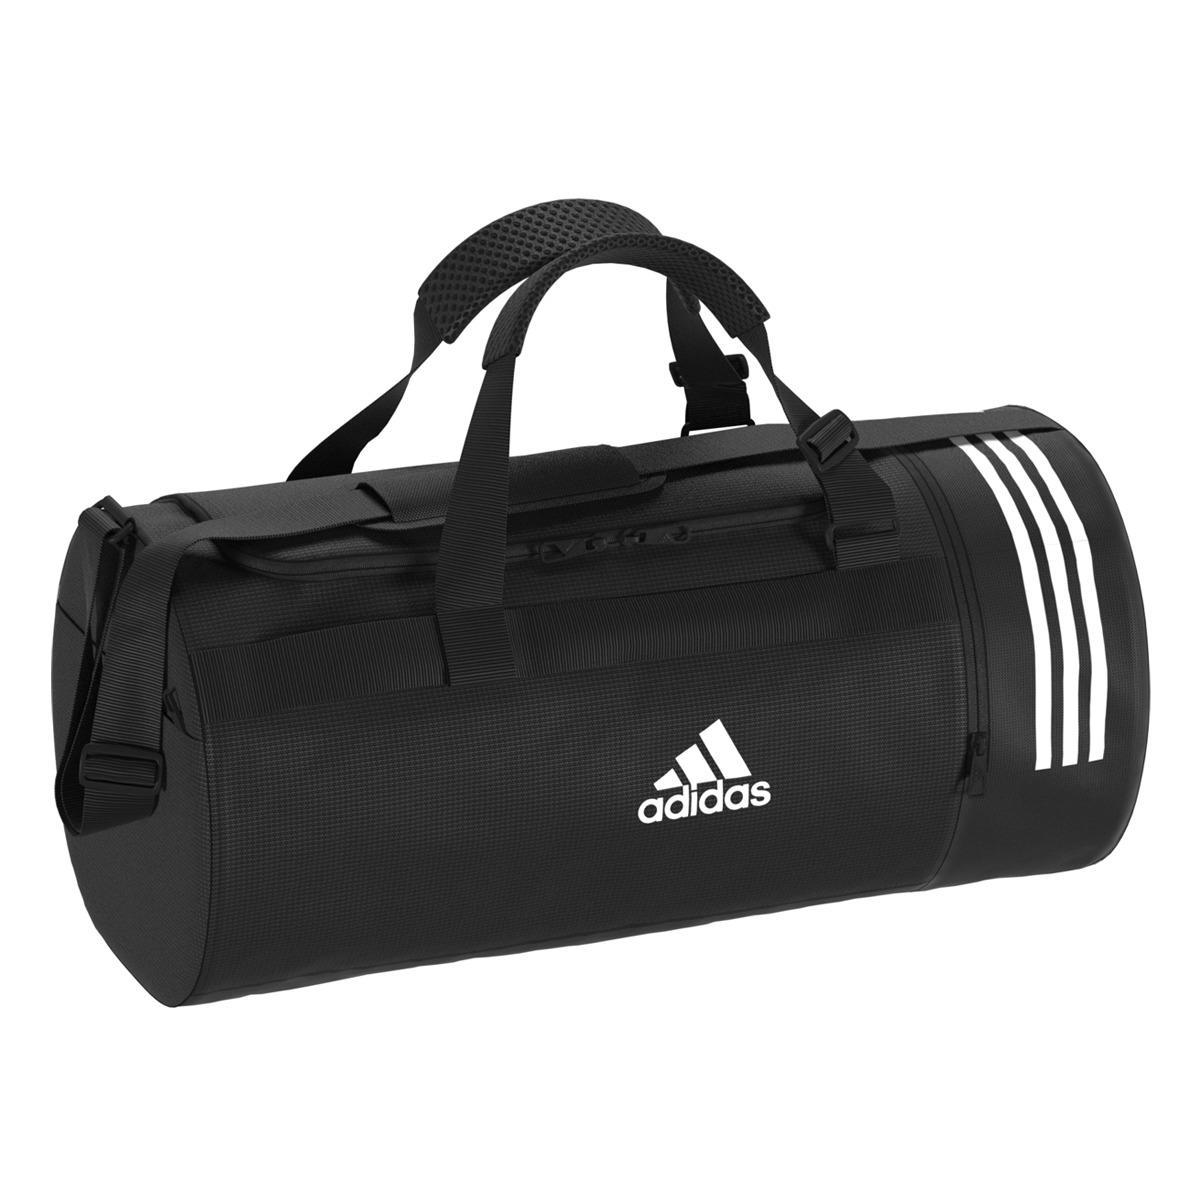 Adidas Convertible 3 Stripes Duffel M Sports Bag in Black for Men - Lyst 0a07ae695a5b0